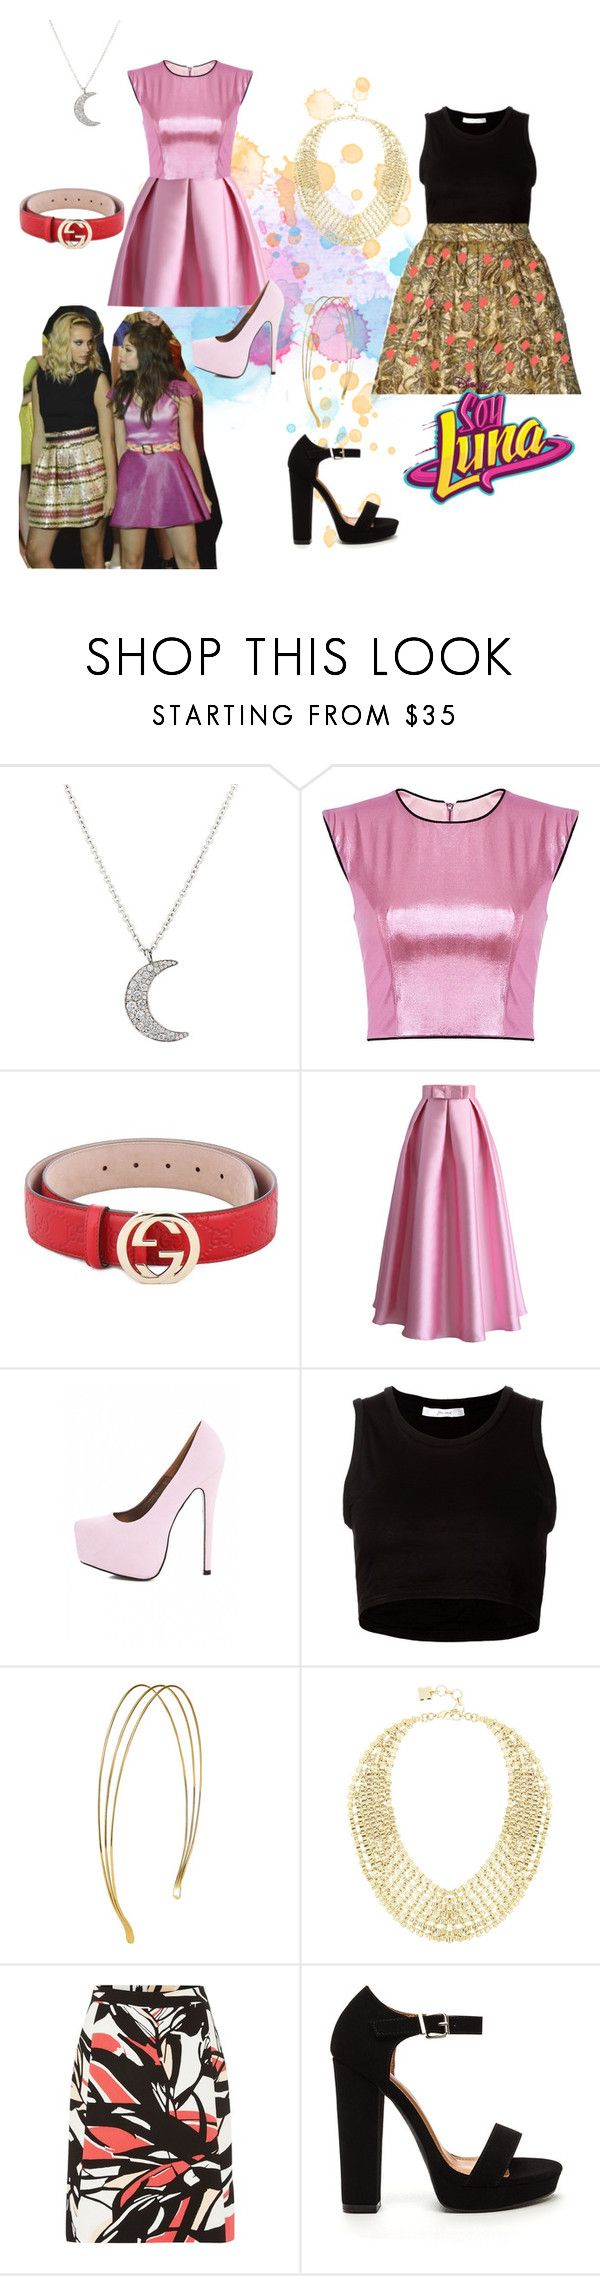 soy luna by maria-cmxiv on Polyvore featuring moda, Julien David, Chicwish, HUGO, AX Paris, BCBGMAXAZRIA, Finn, Gucci and Prada